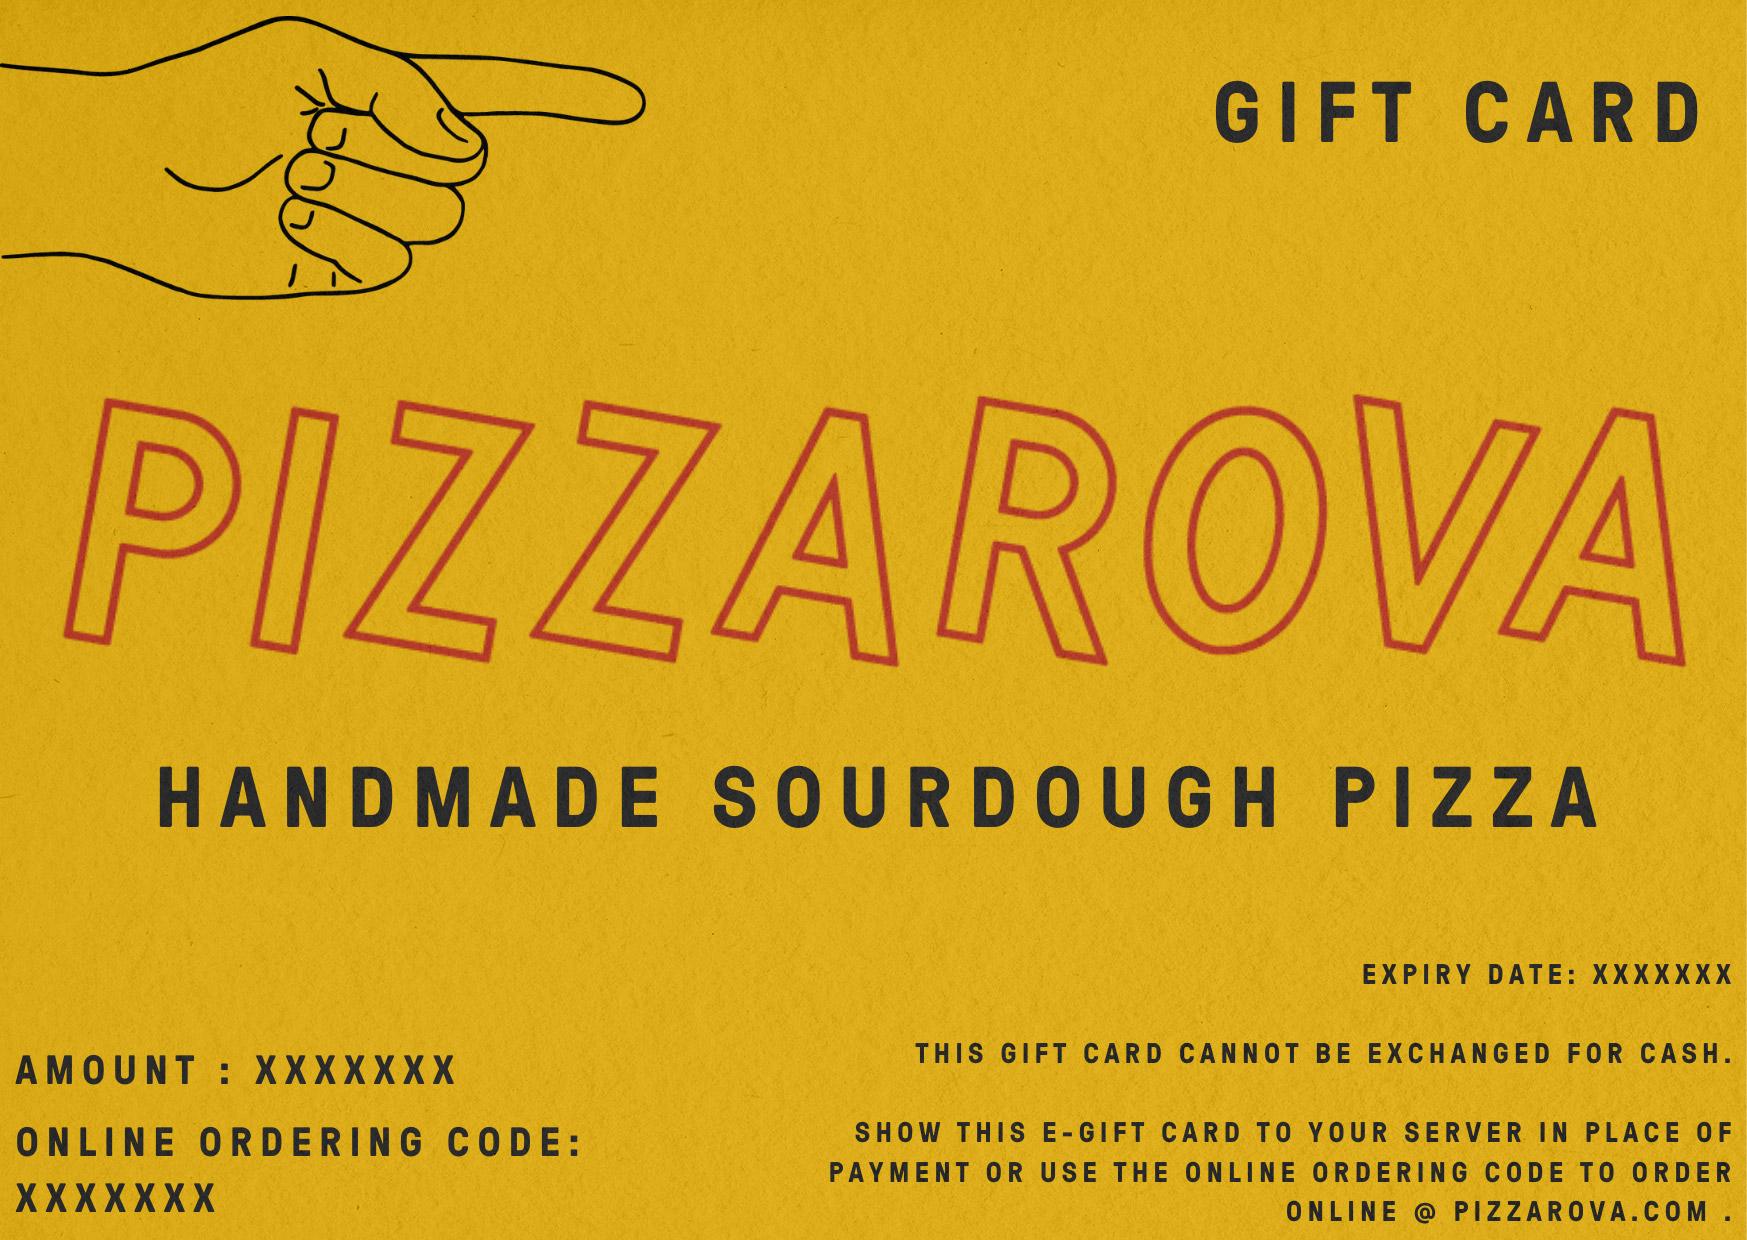 Pizzarova gift card